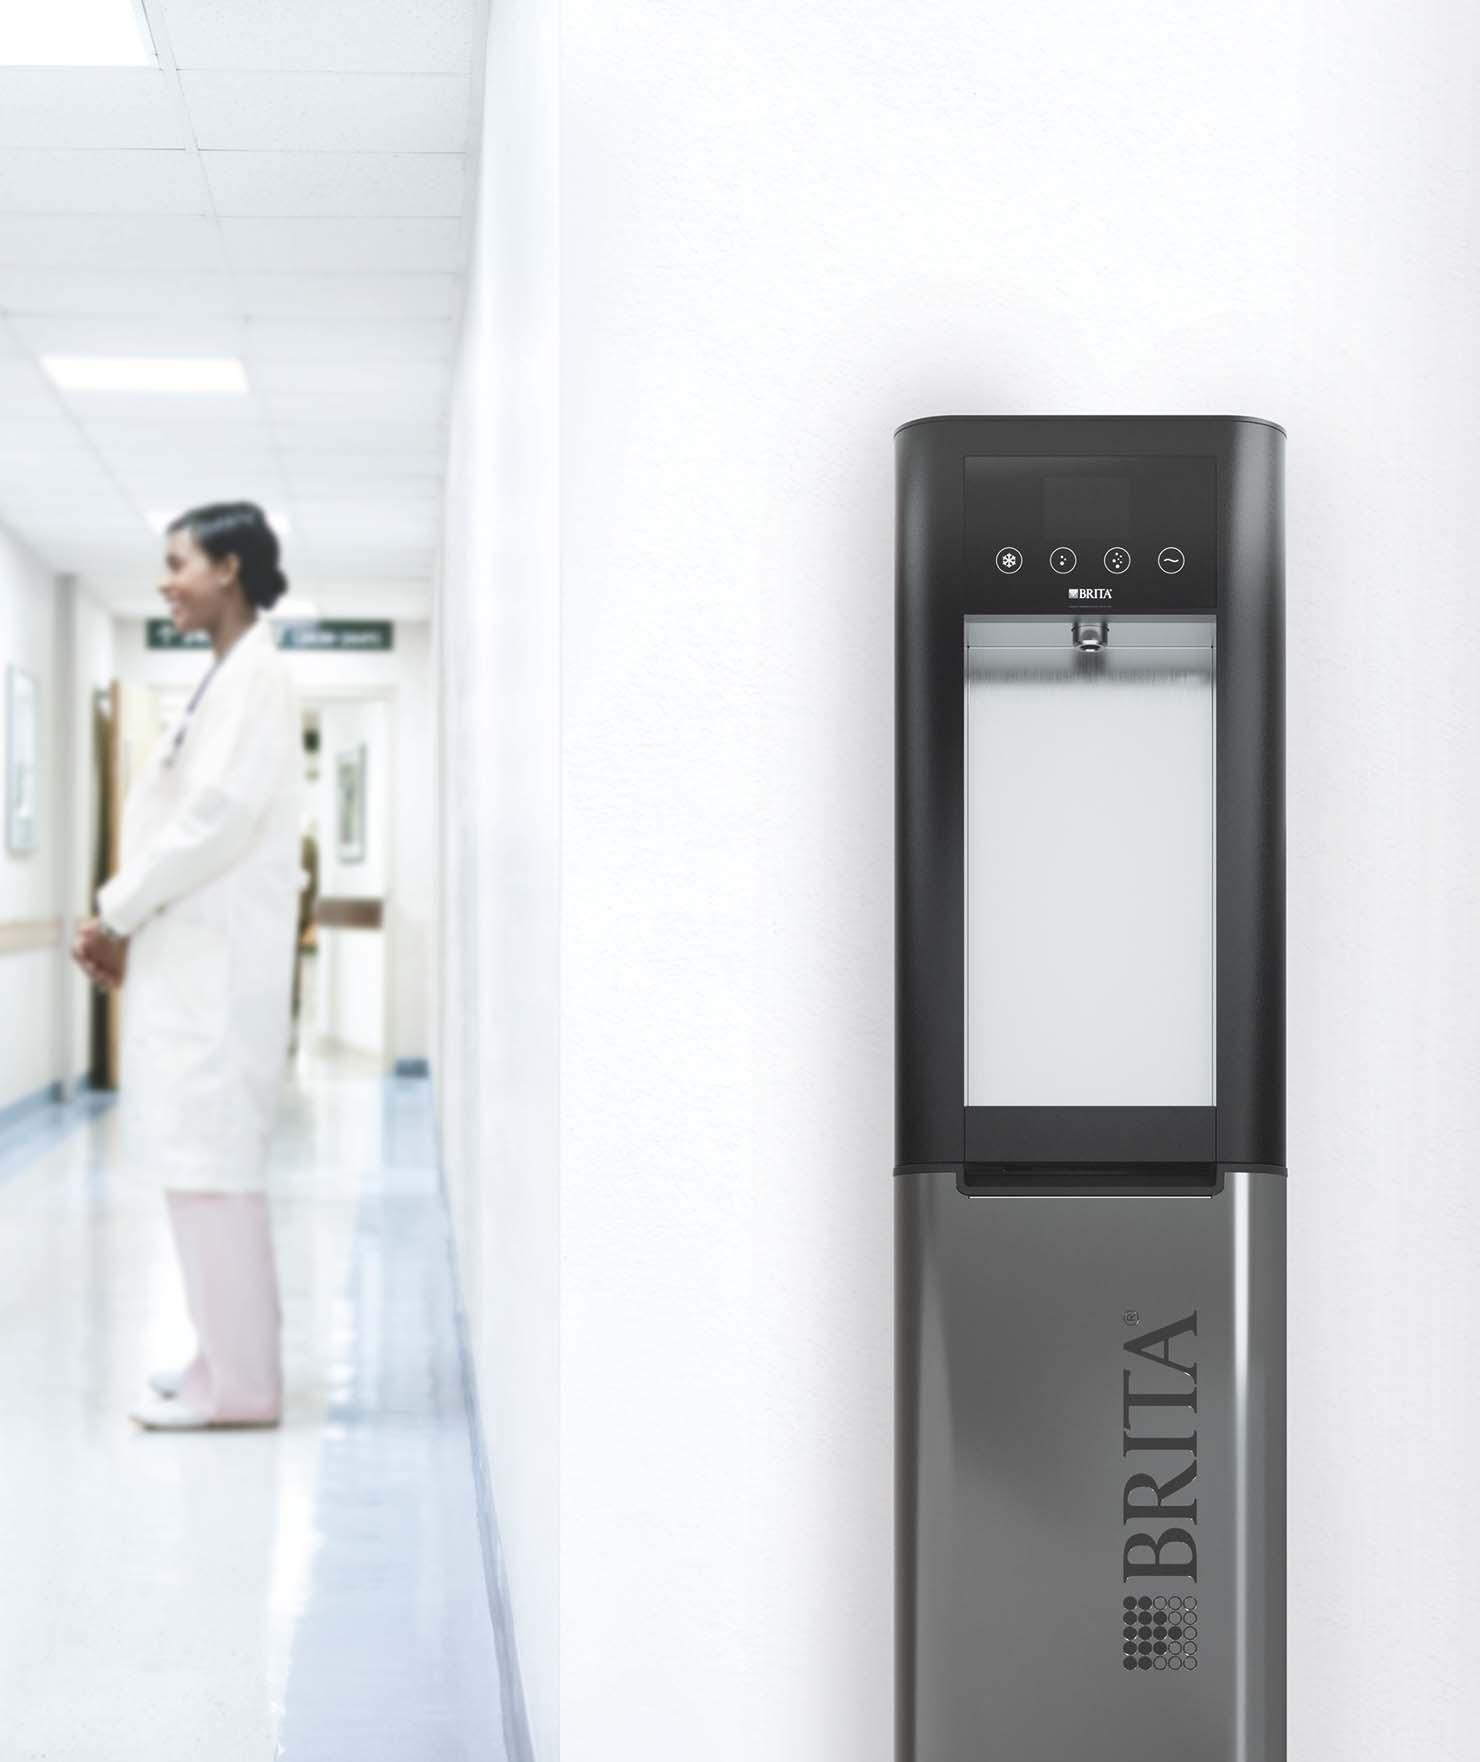 BRITA dystrybutory wody dla szpitali – korytarz